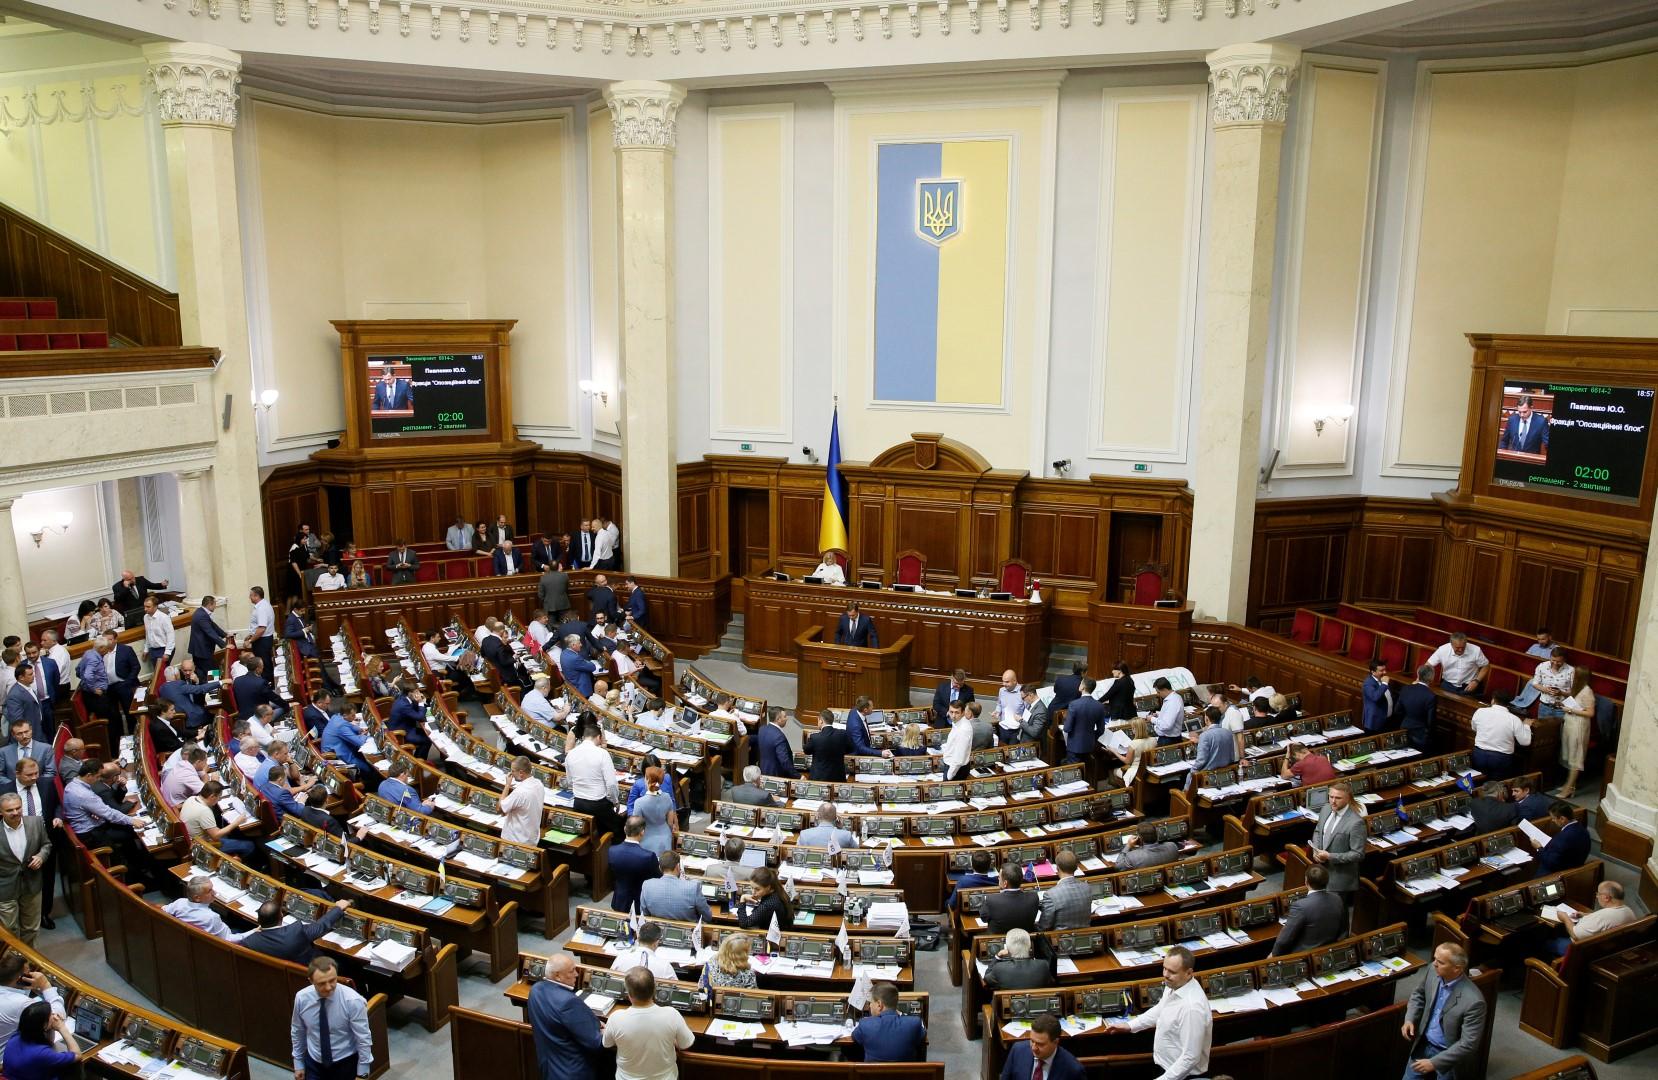 Lawmakers attend a session at the Ukrainian parliament in Kiev, Ukraine, July 13, 2017. REUTERS/Valentyn Ogirenko - RC1182ACC780